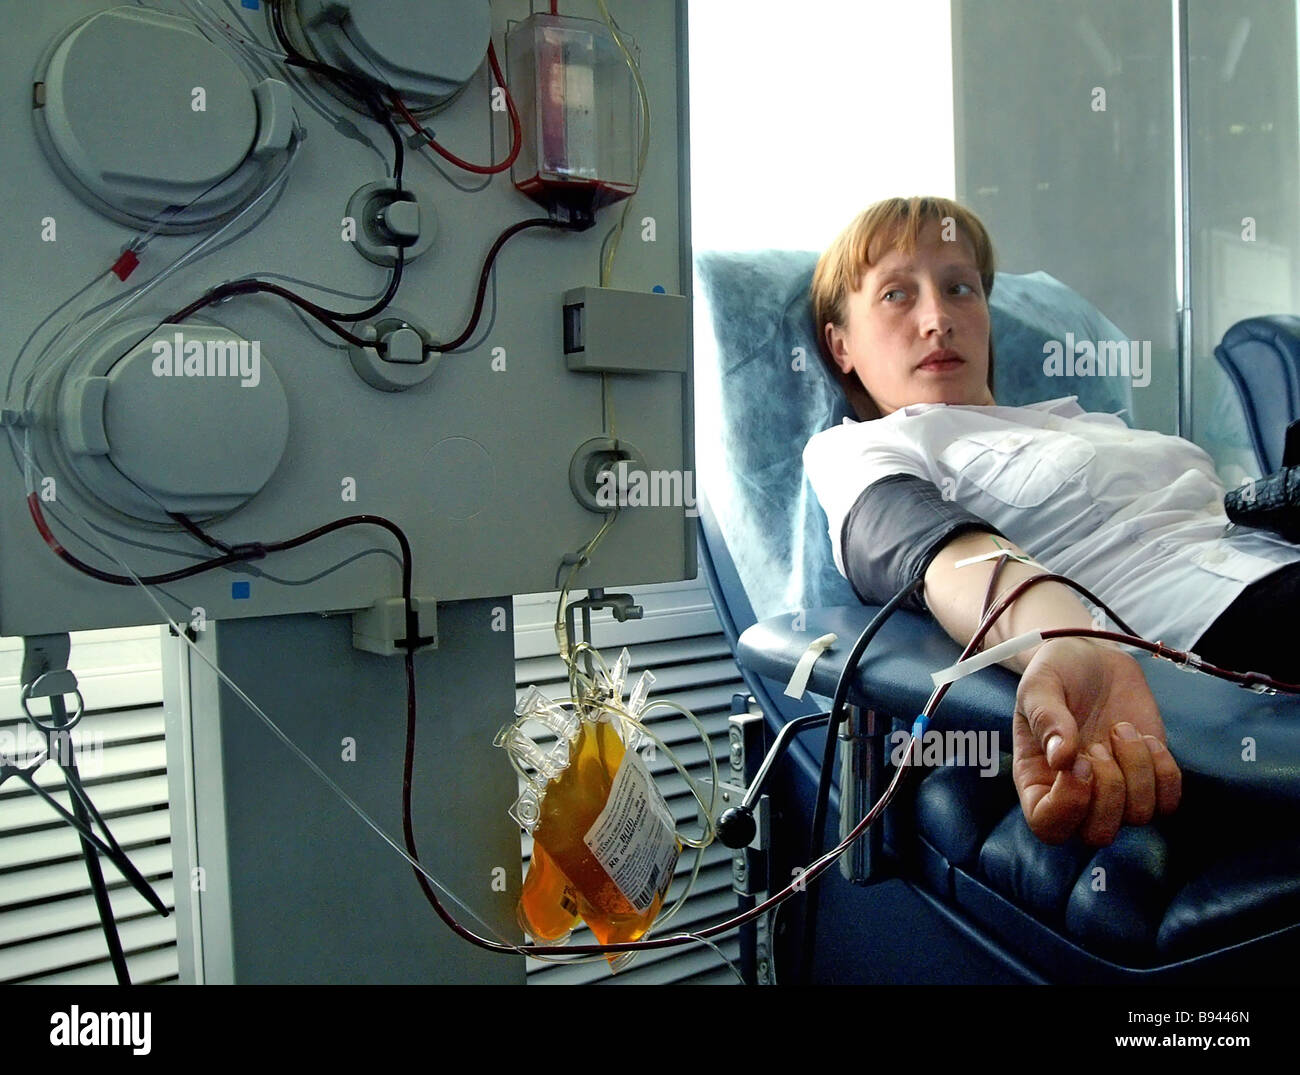 A blood transfusion center in Samara on the Volga - Stock Image